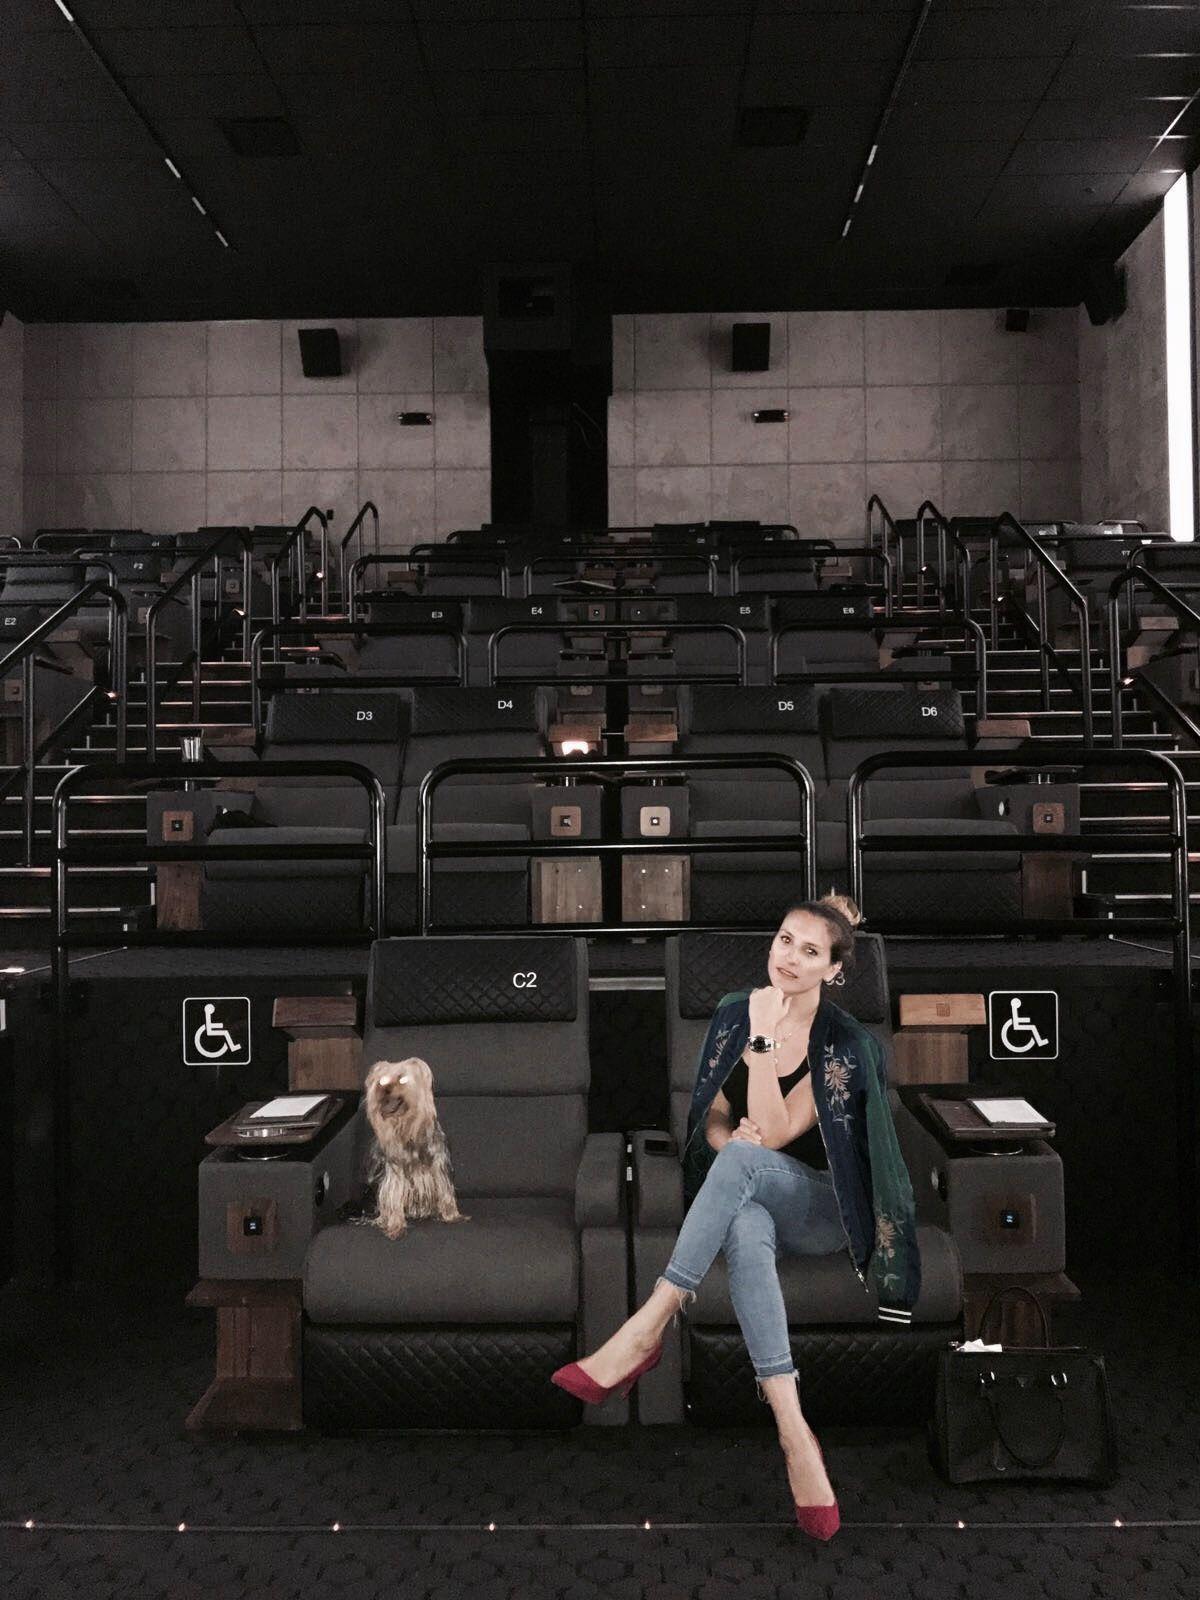 Cmx cinema the vip experience opened at brickell city